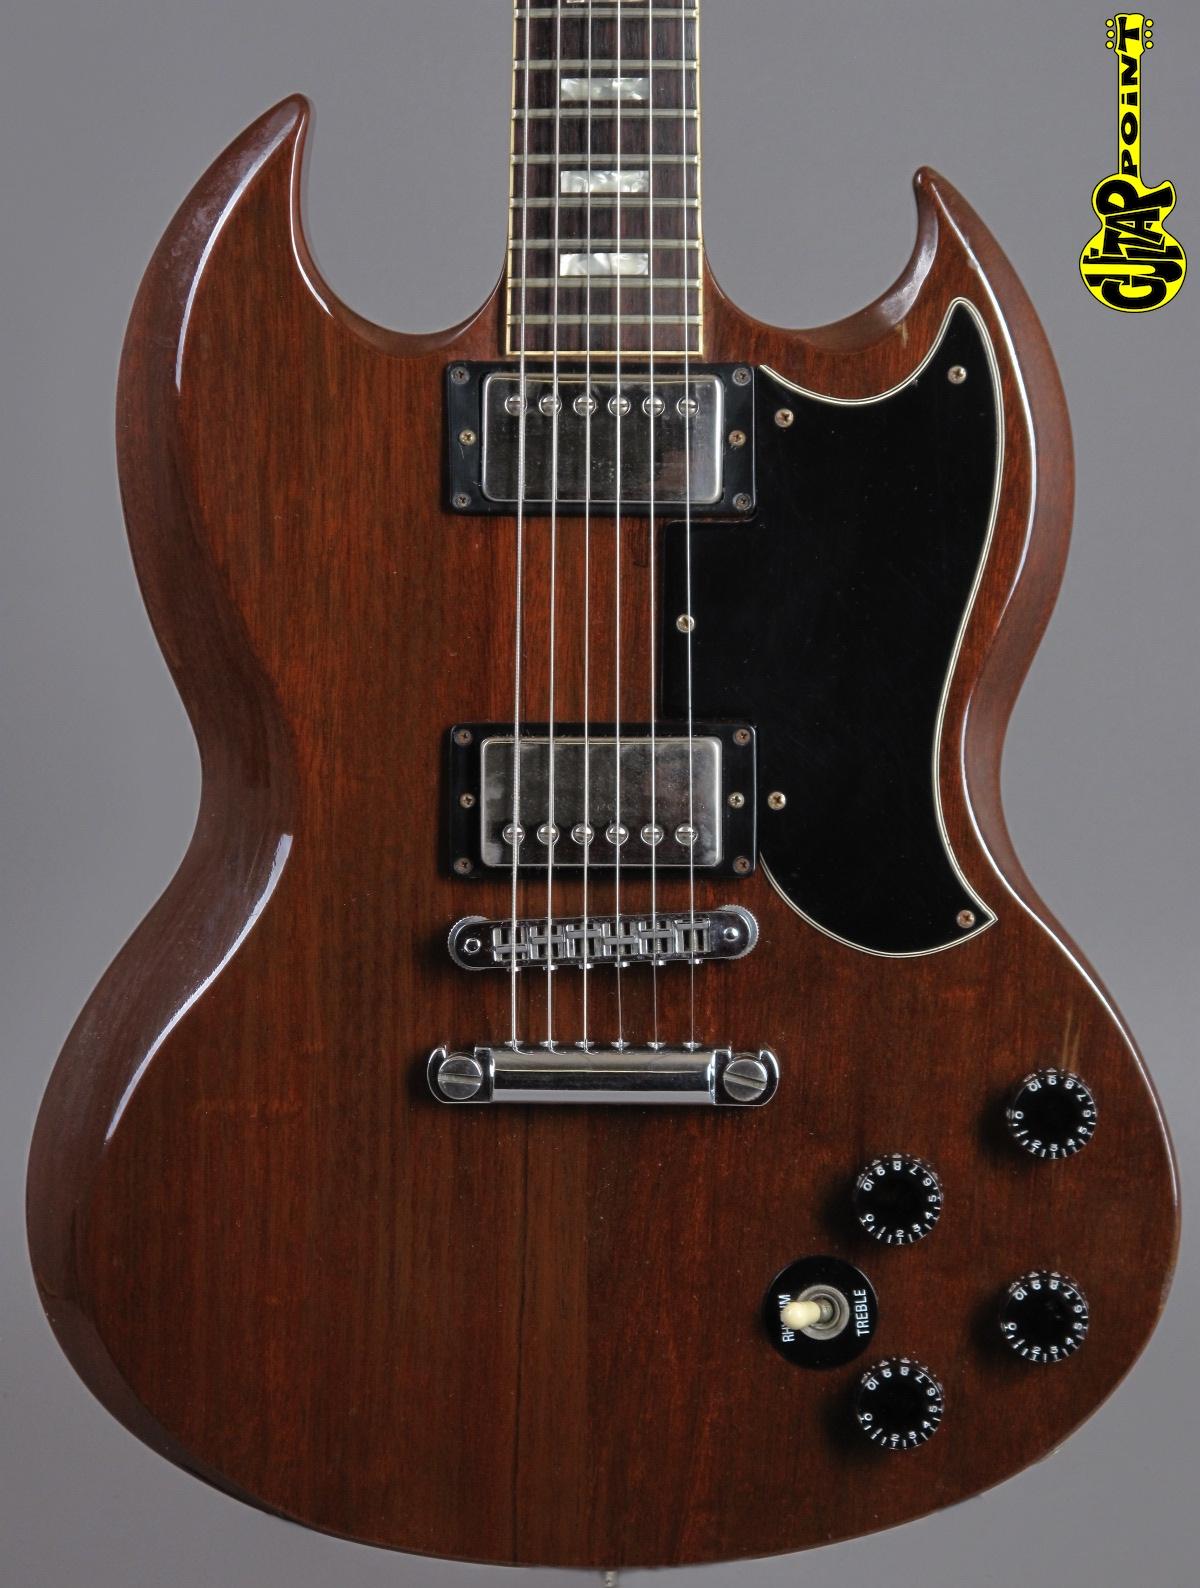 1984 Gibson SG Standard - Walnut